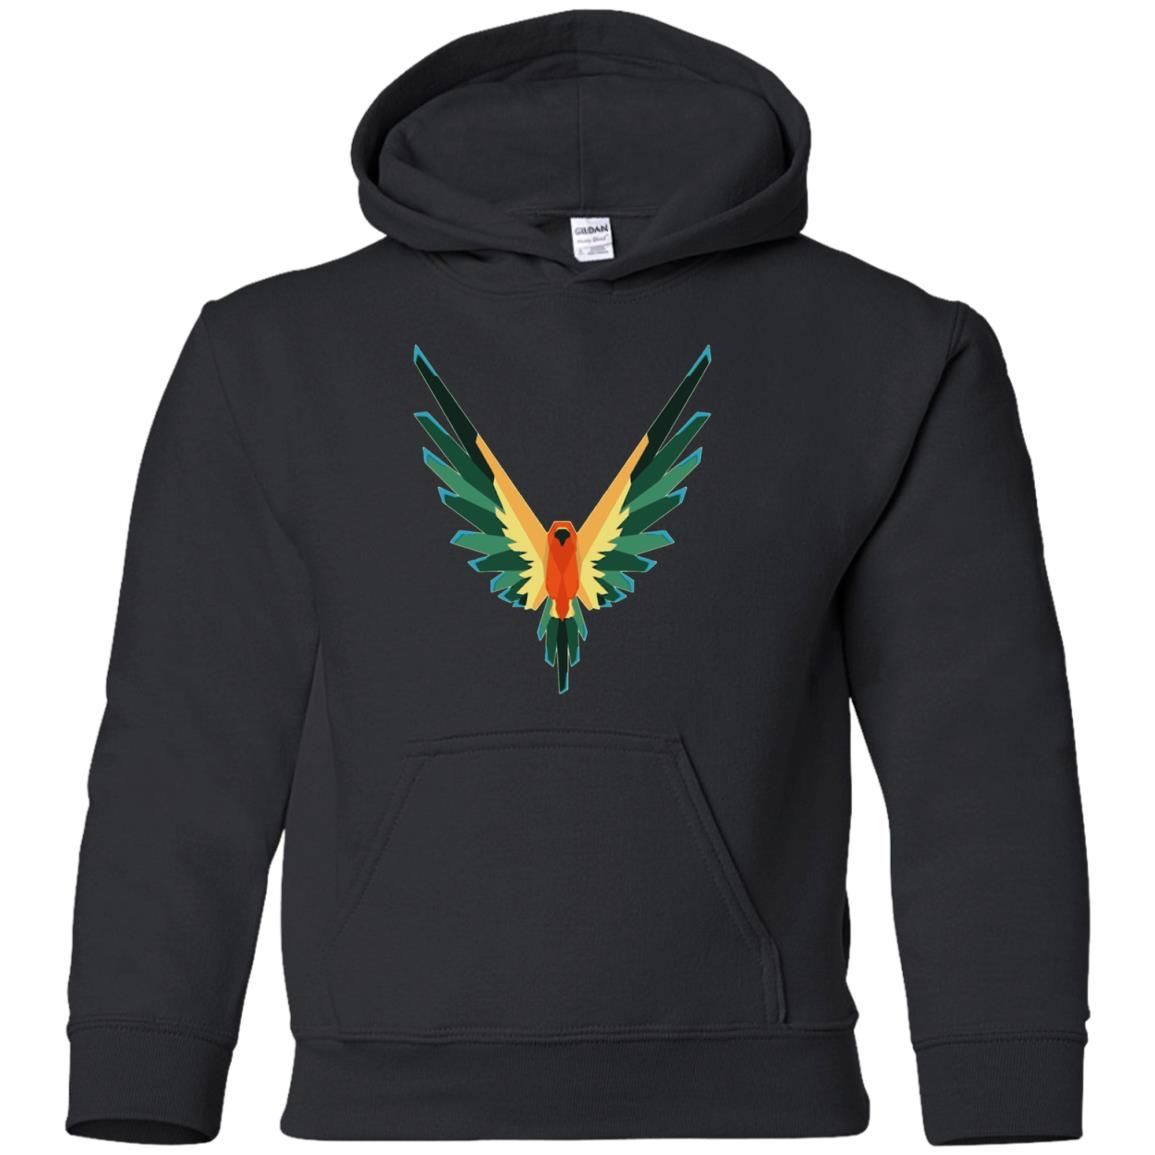 image 1234 - Logan Paul Maverick kid shirt & sweatshirt